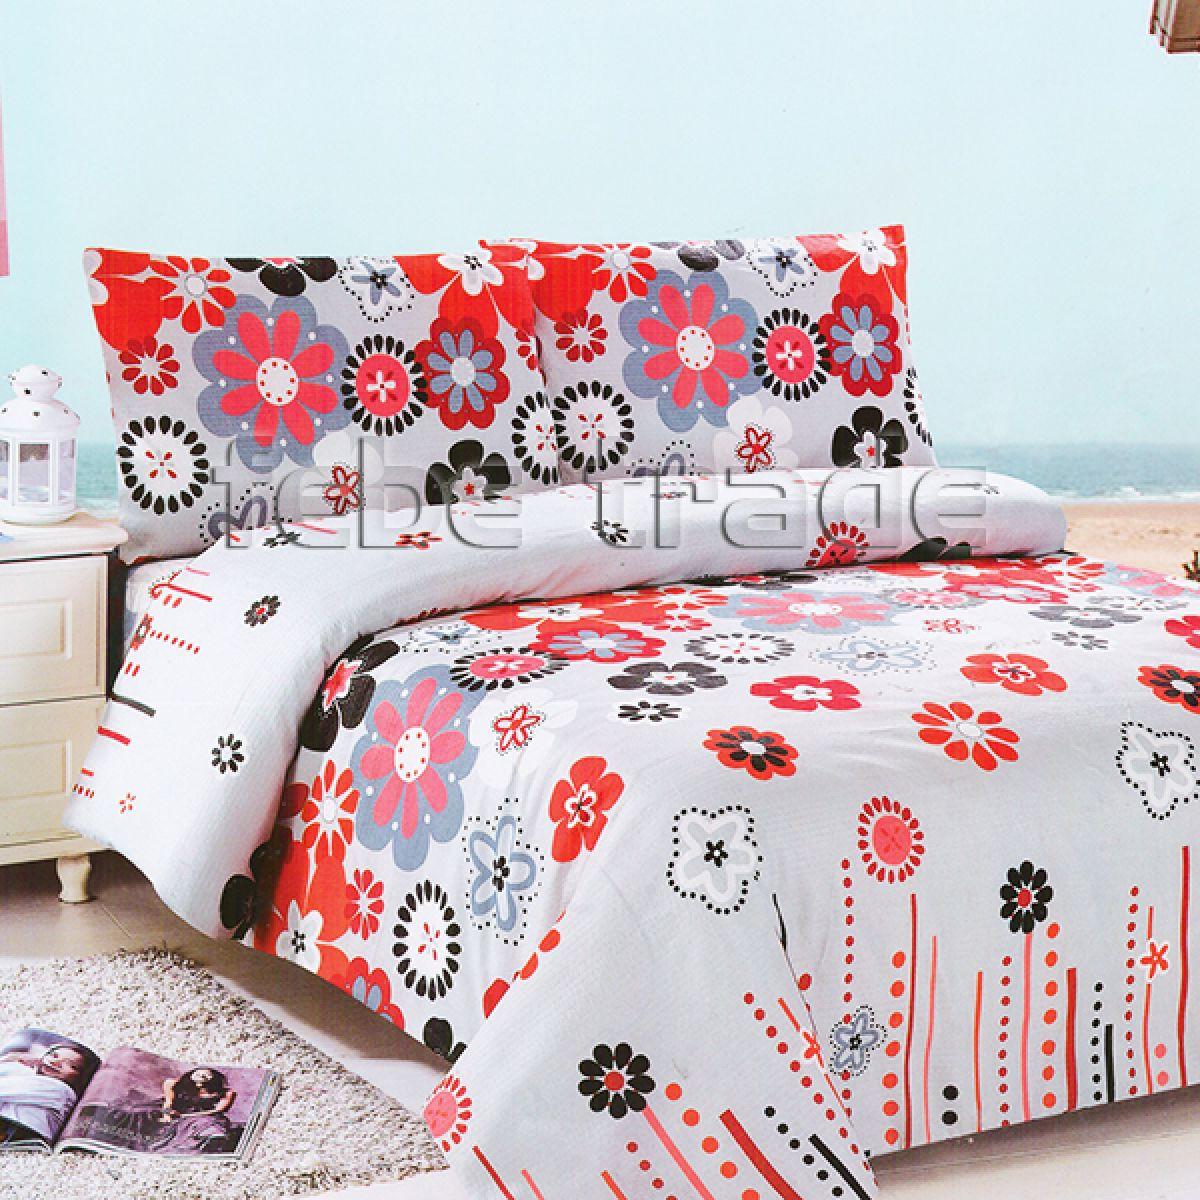 Cheap Beddings - TPR-YP-479 - 220x200cm - 3 pcs